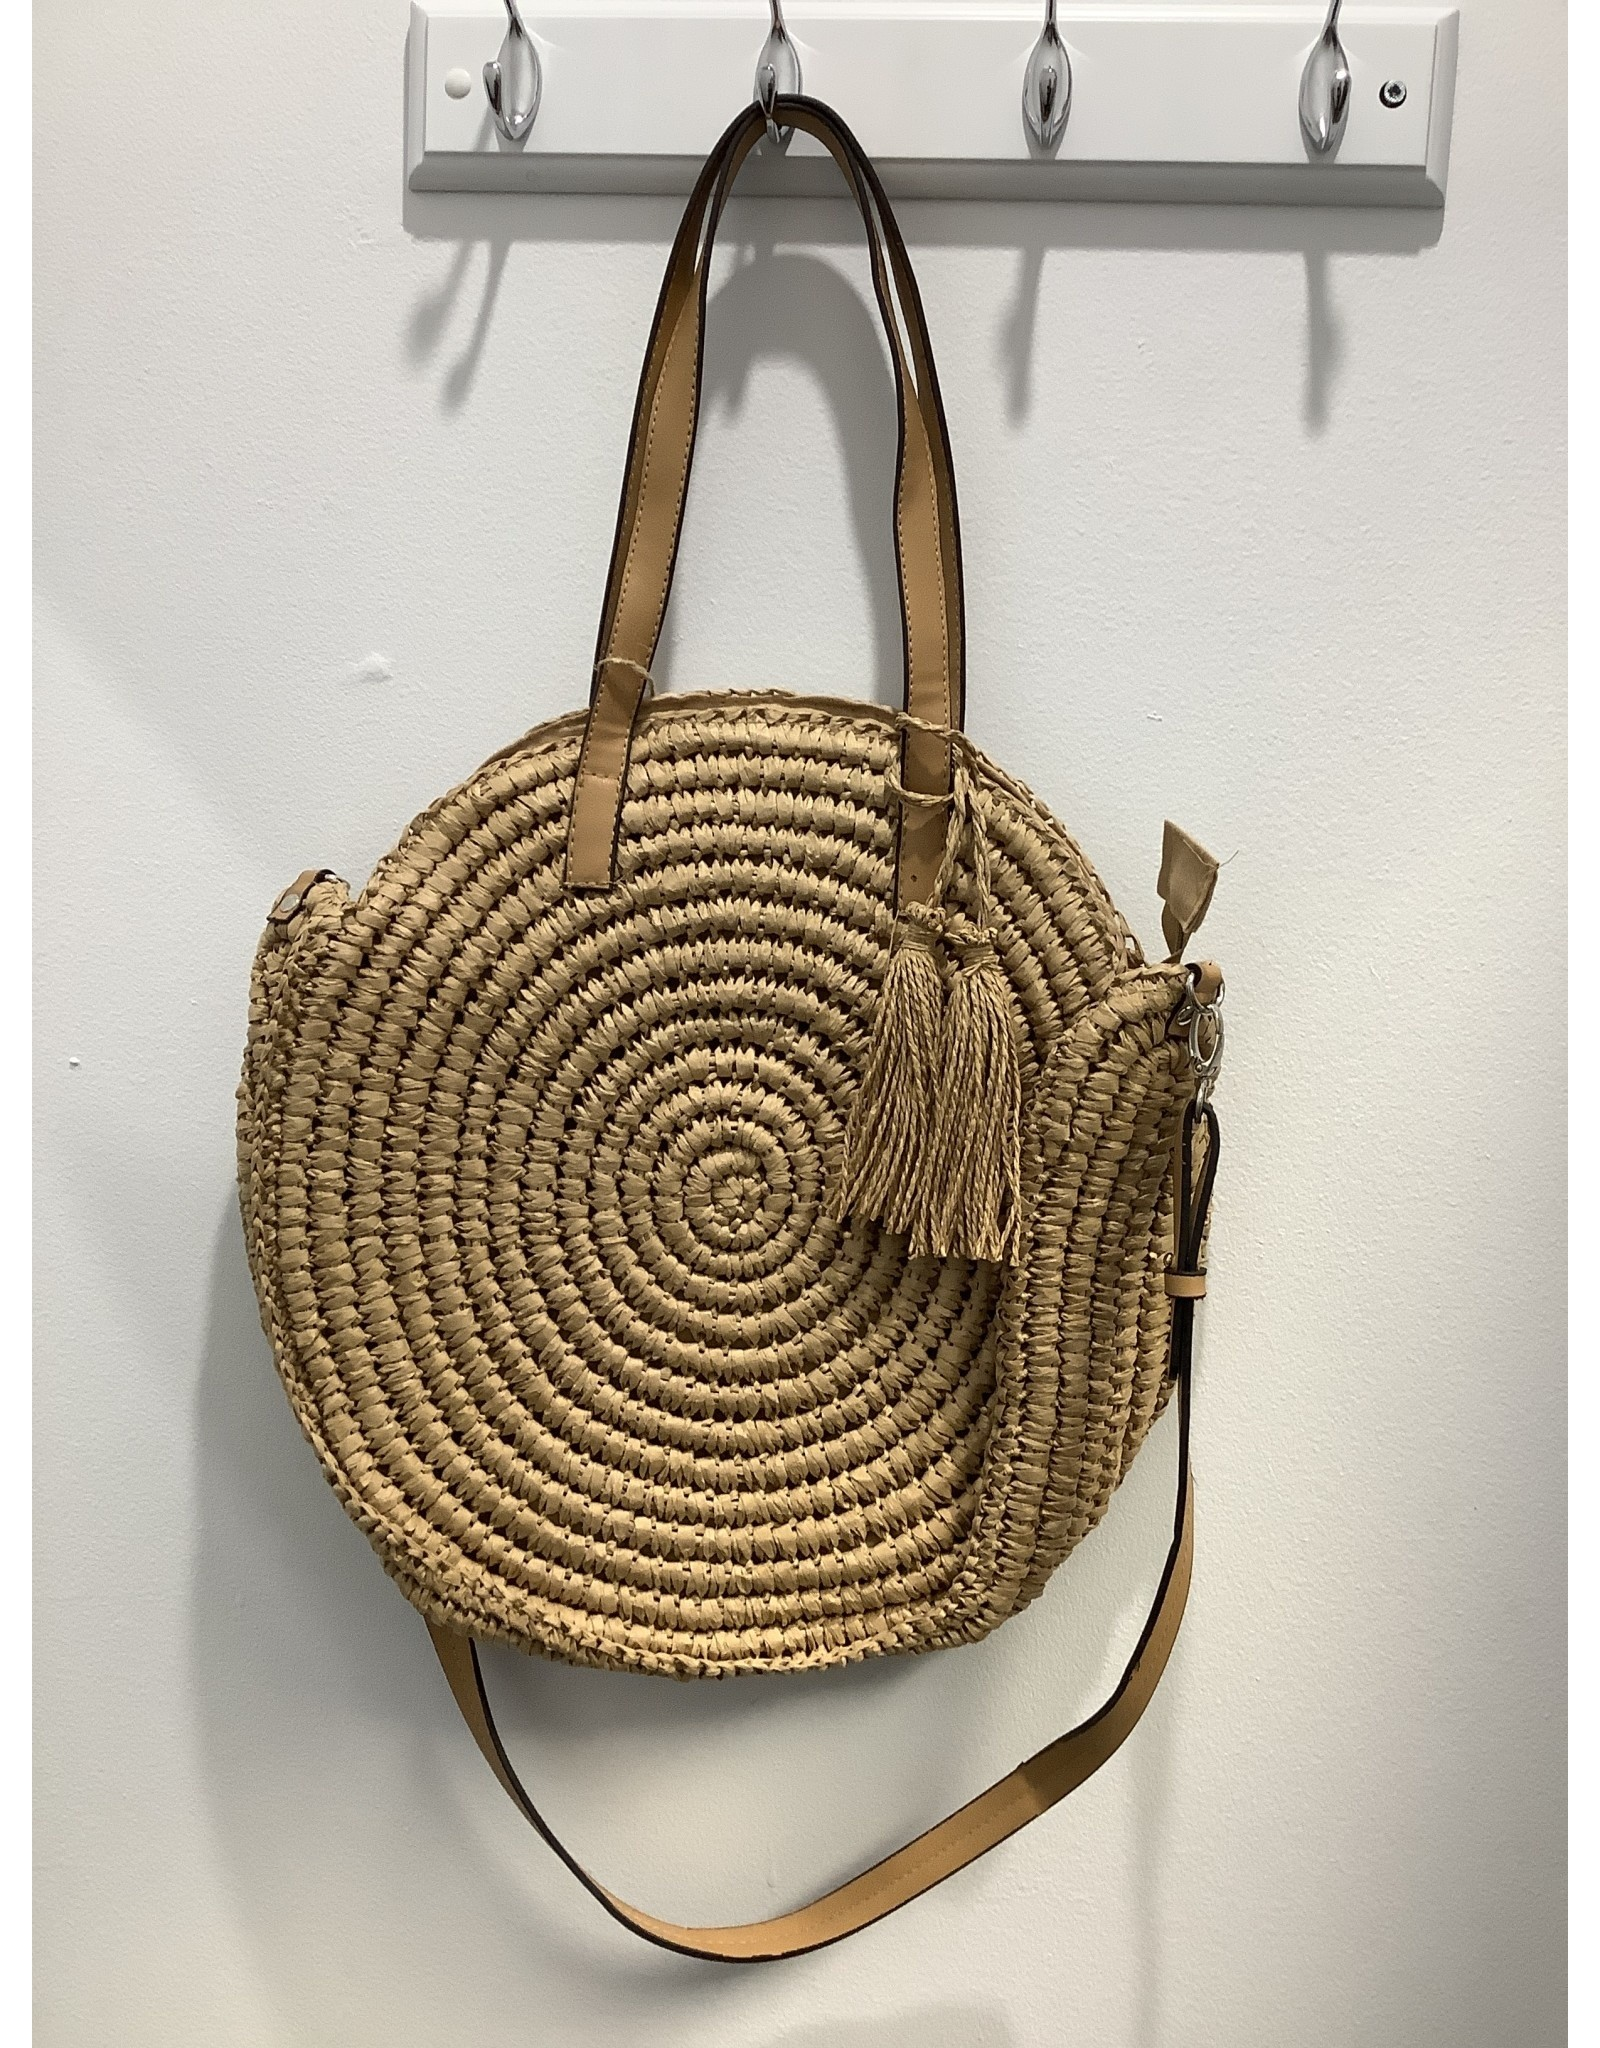 Isabella Boho Circle Woven Bag PV Straps